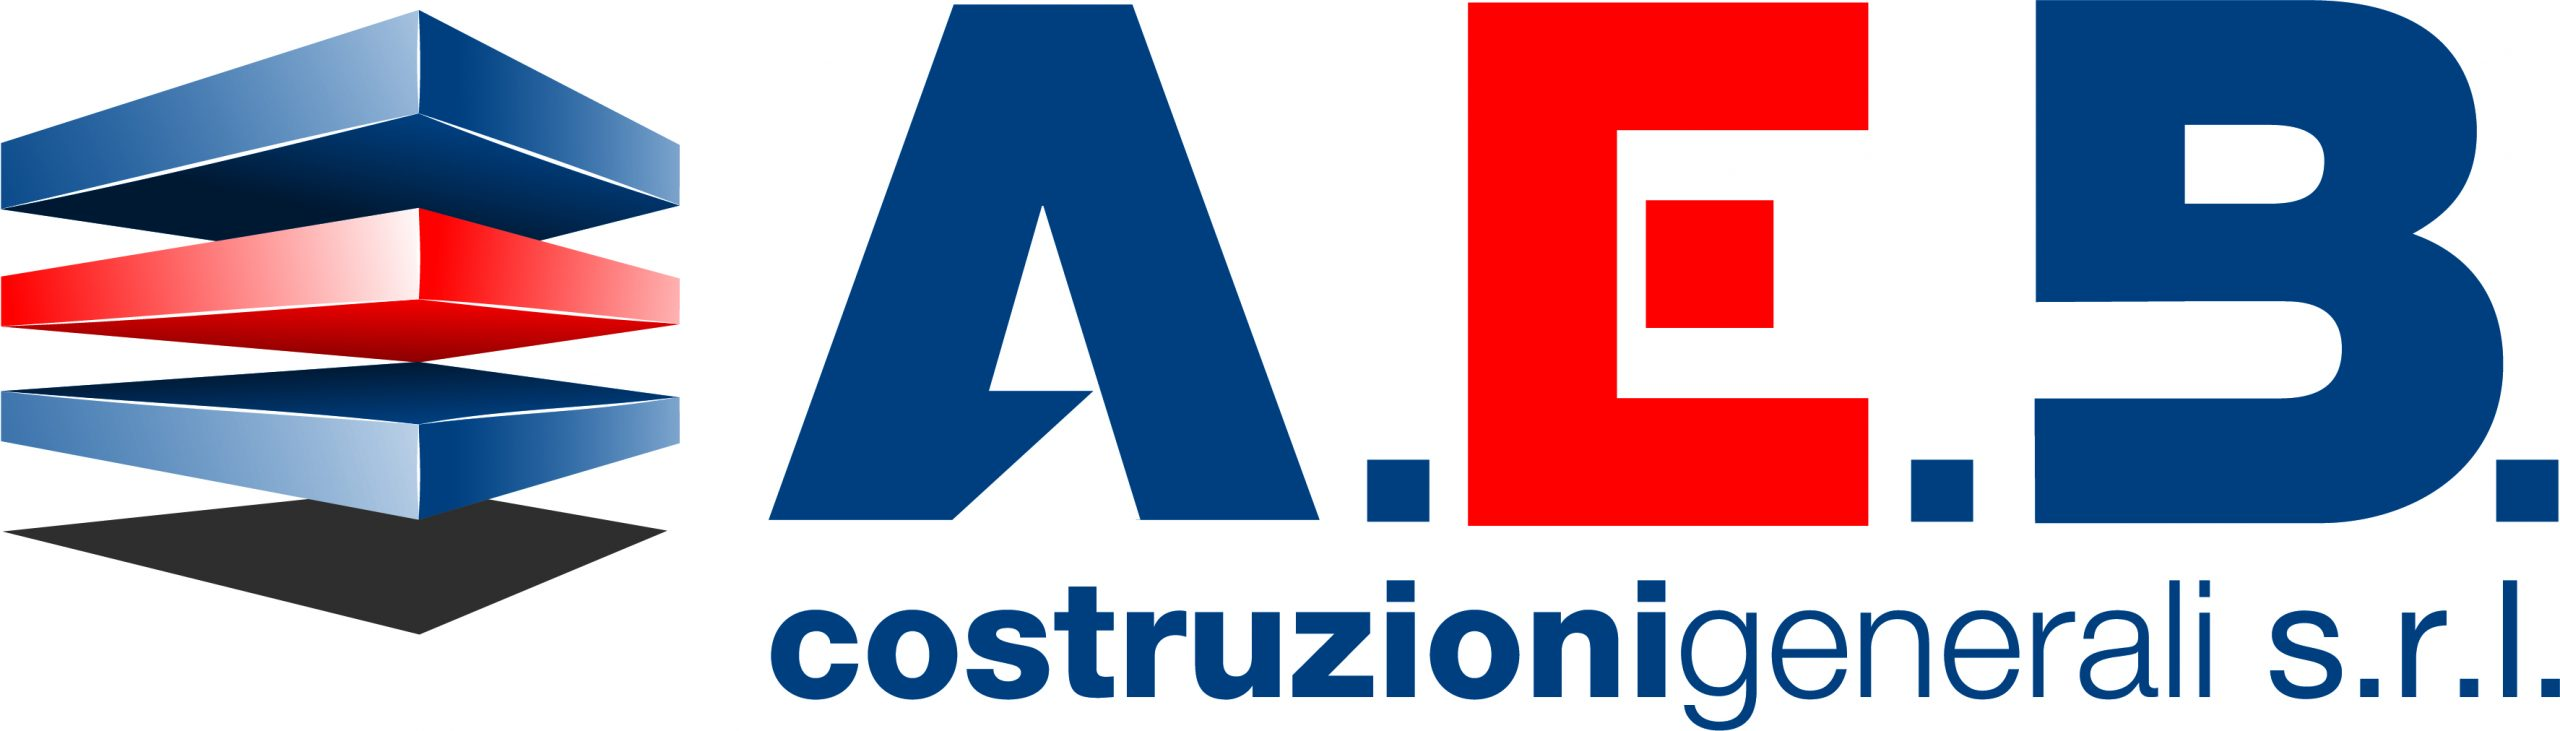 aeb costruzioni | costruzioni generali